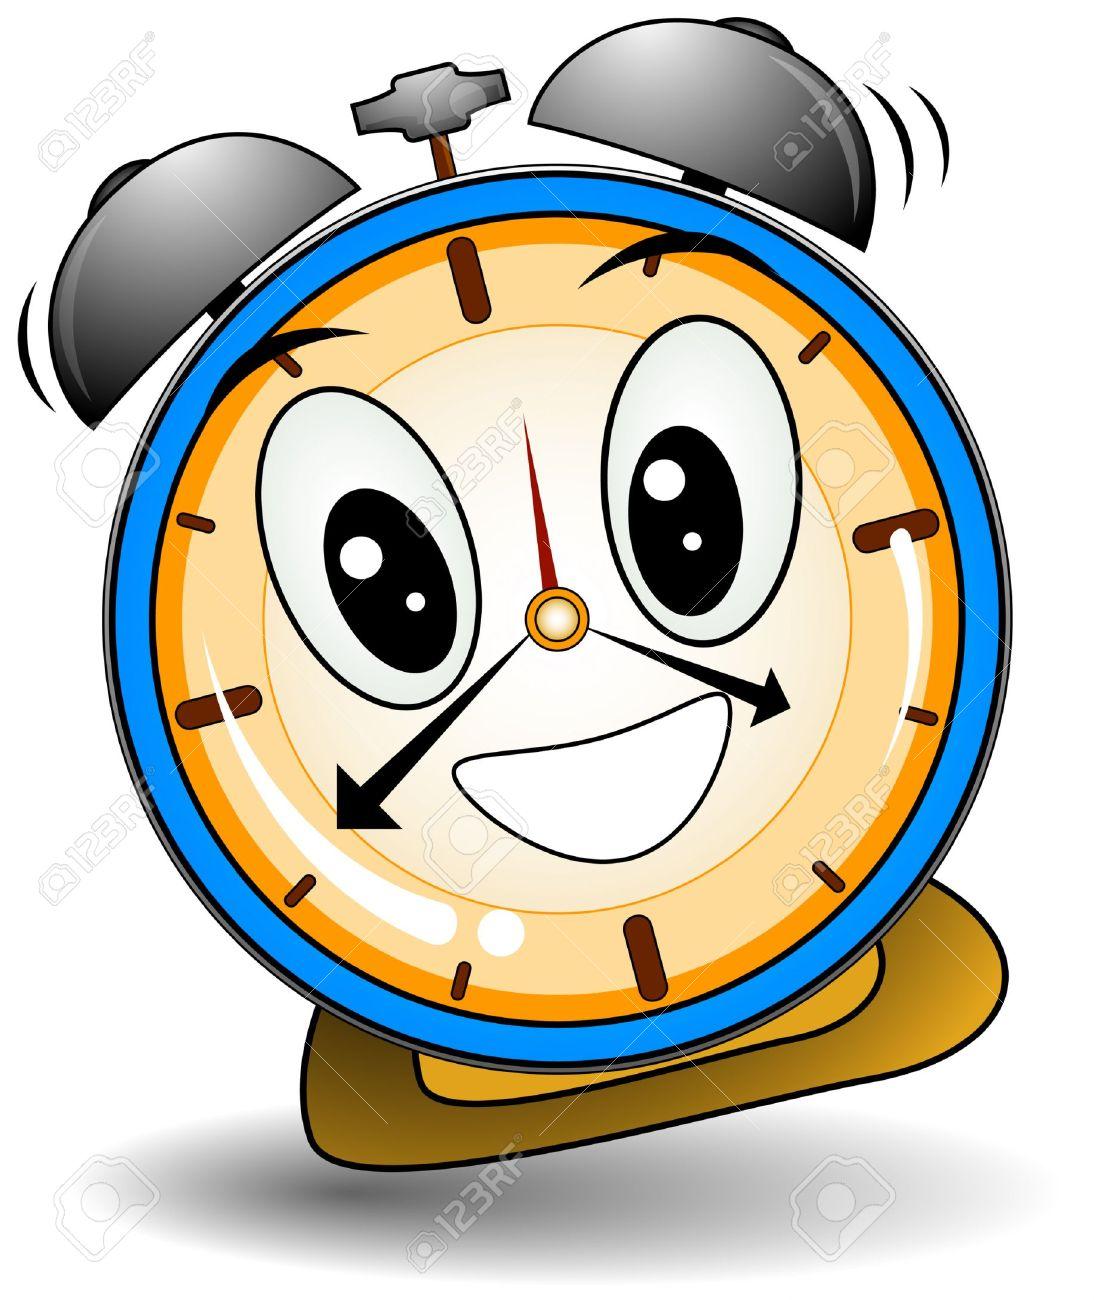 Cartoon alarm clock clipart image #10689.